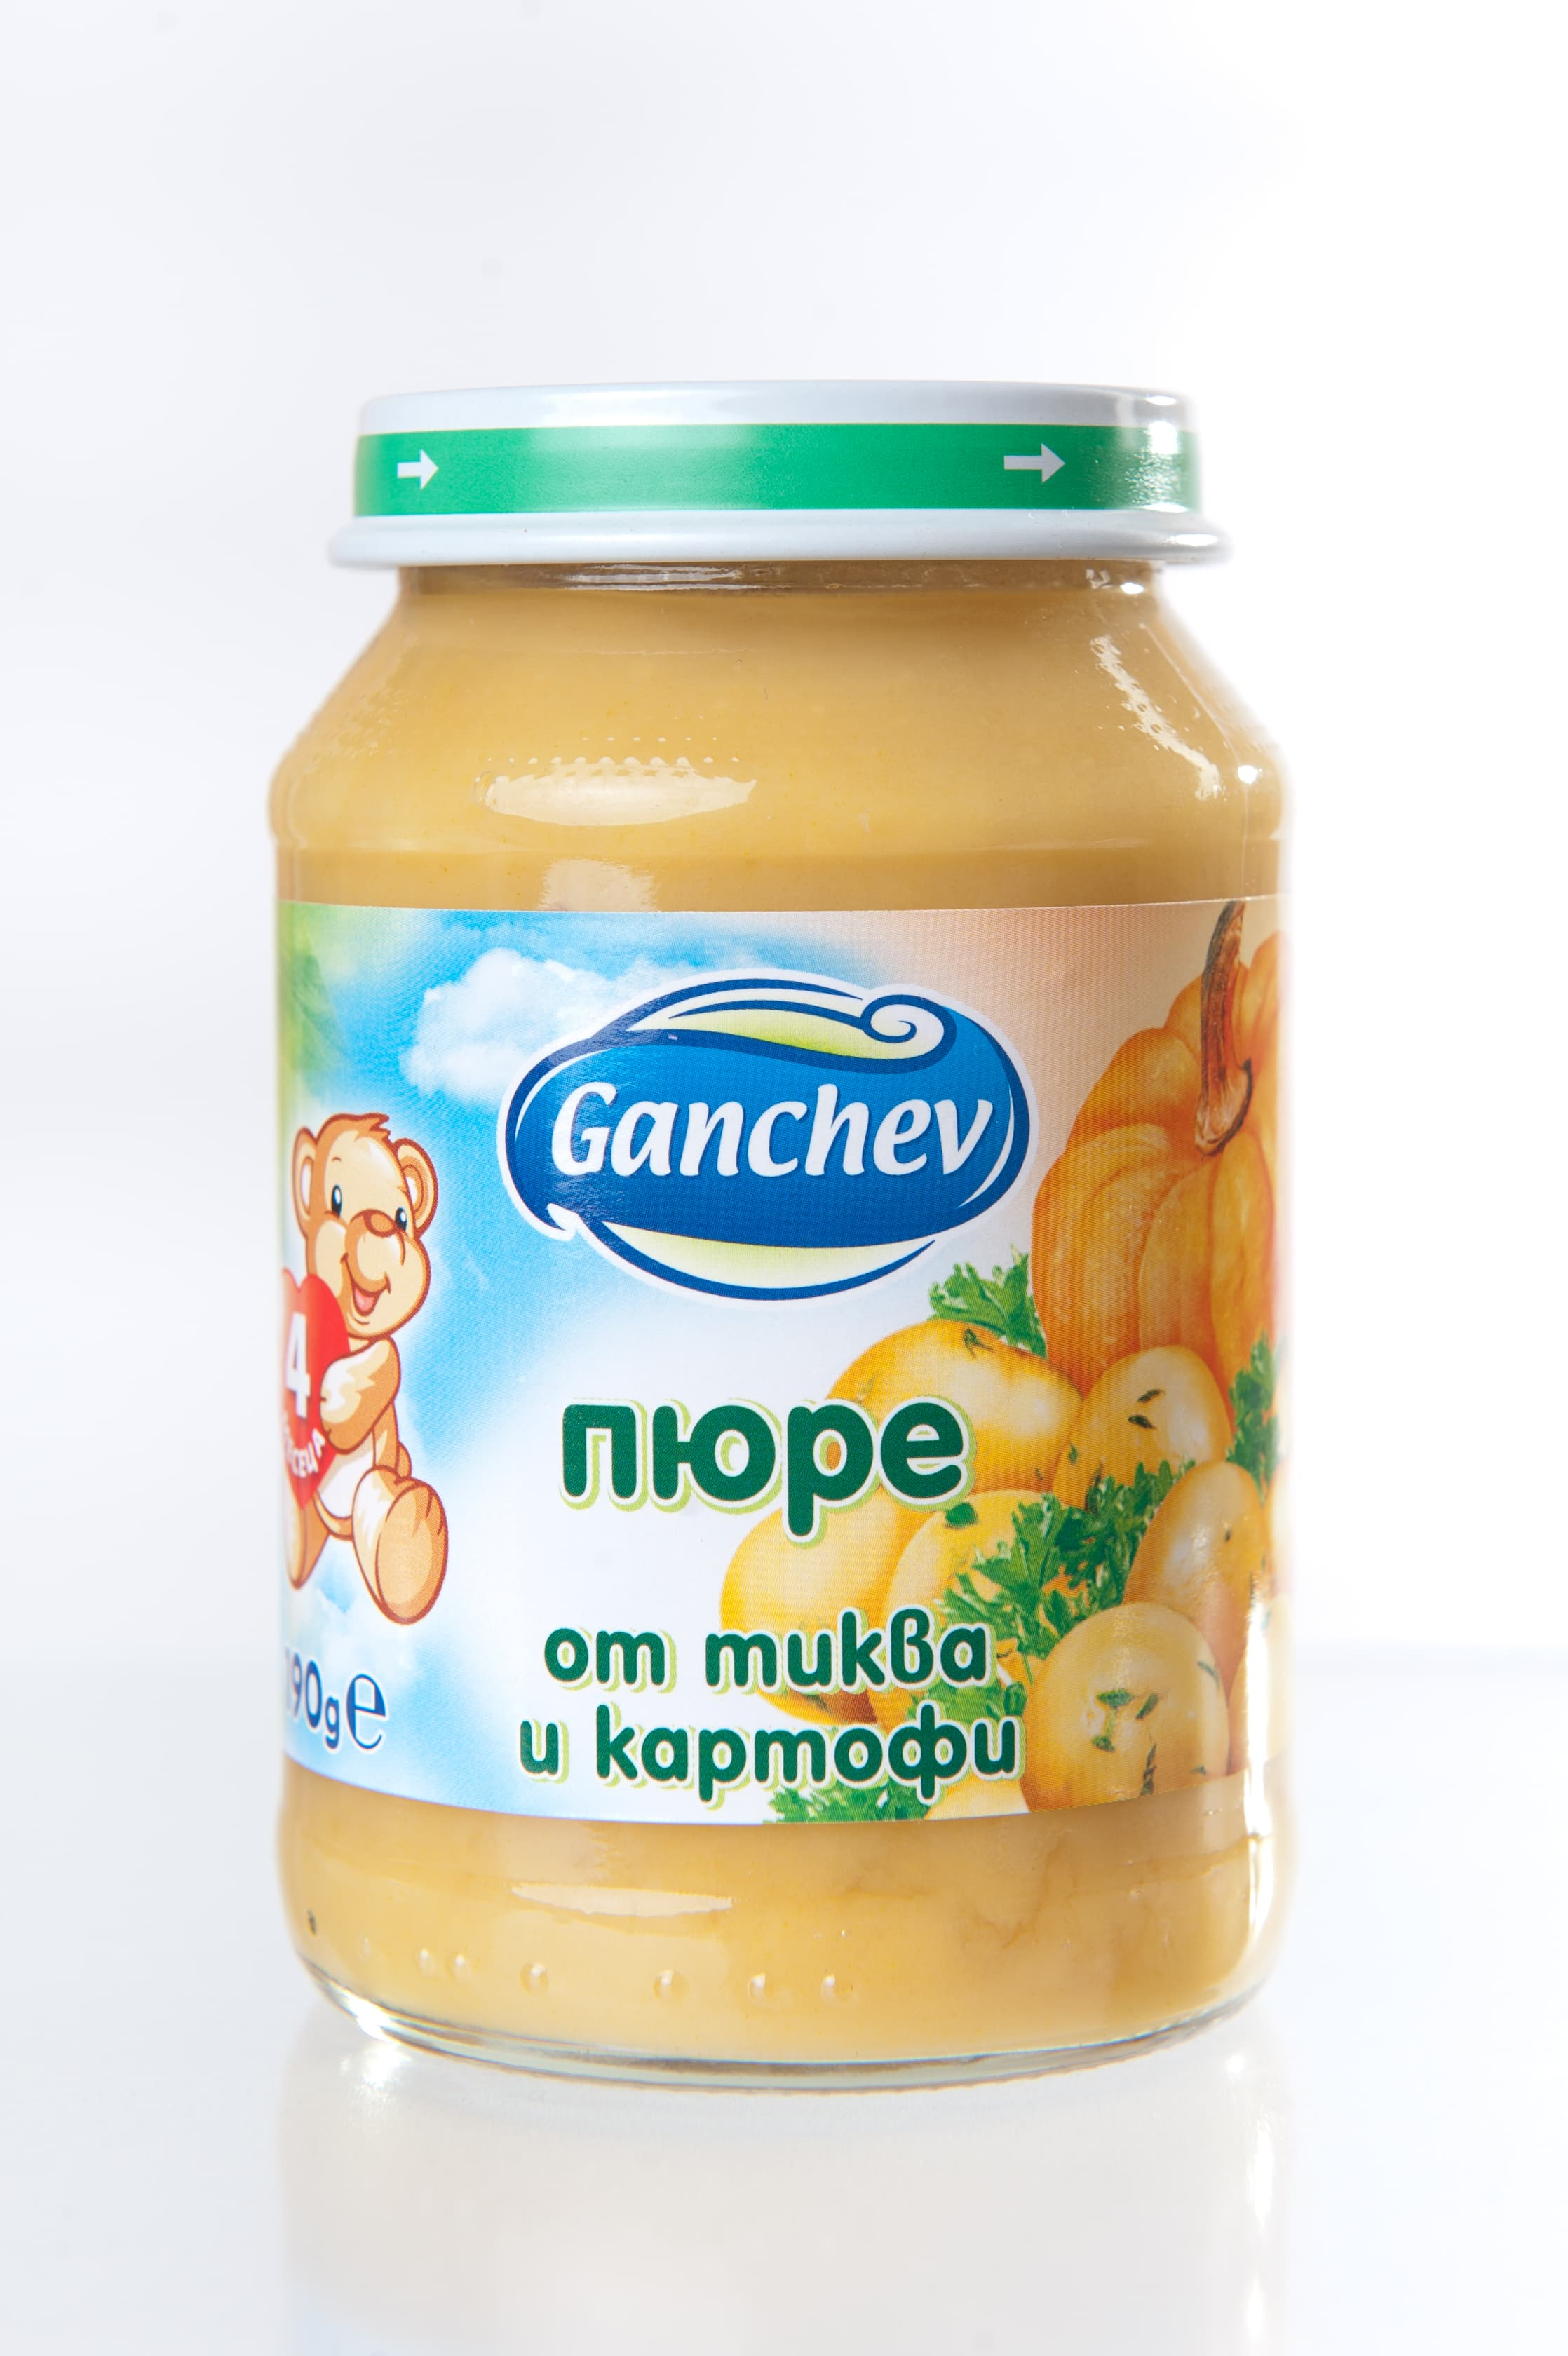 Ganchev-пюре тиква и картофи 4м+ 190гр